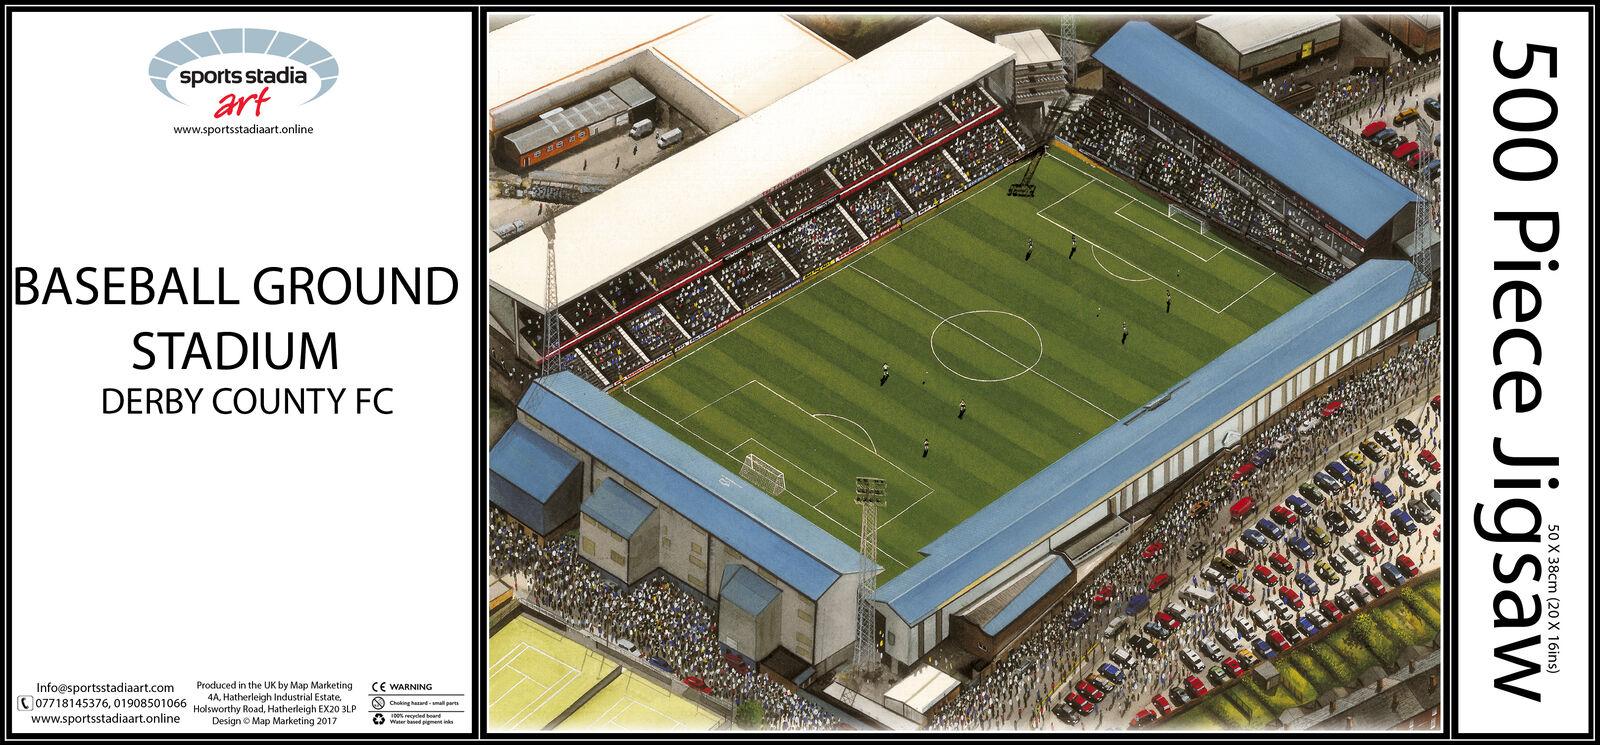 Baseball Ground Stadia Fine Art 500pc Jigsaw Puzzle - Derby County Football Club